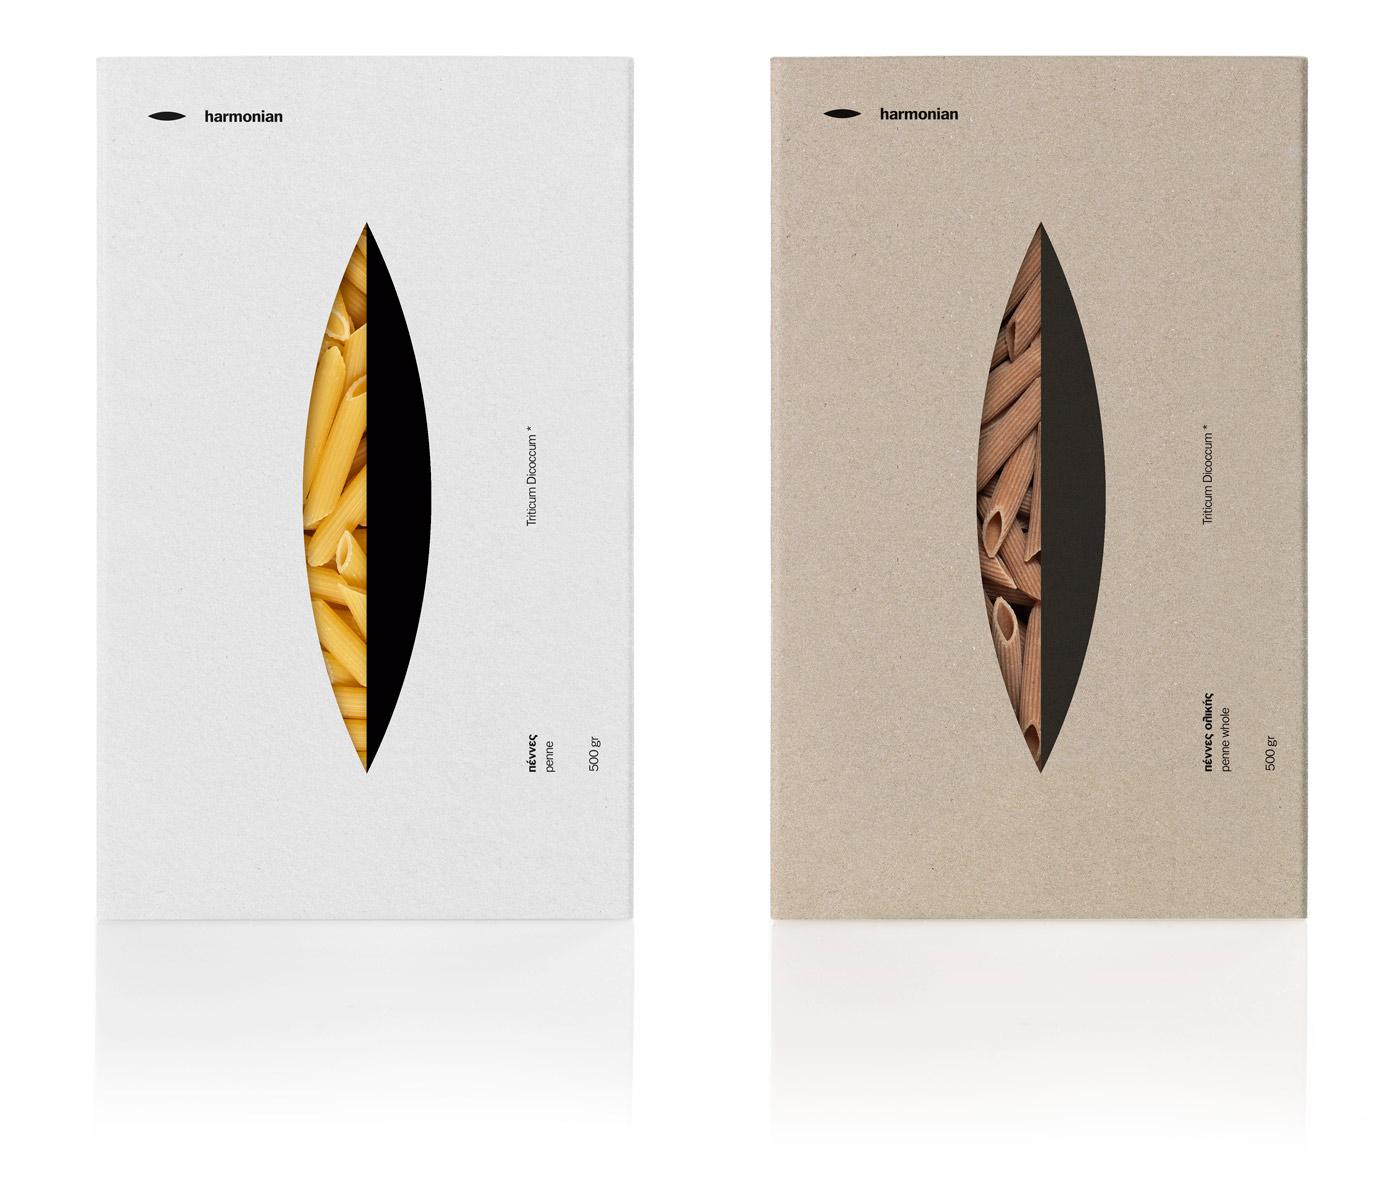 mousegraphics-diseno-oldskull-22